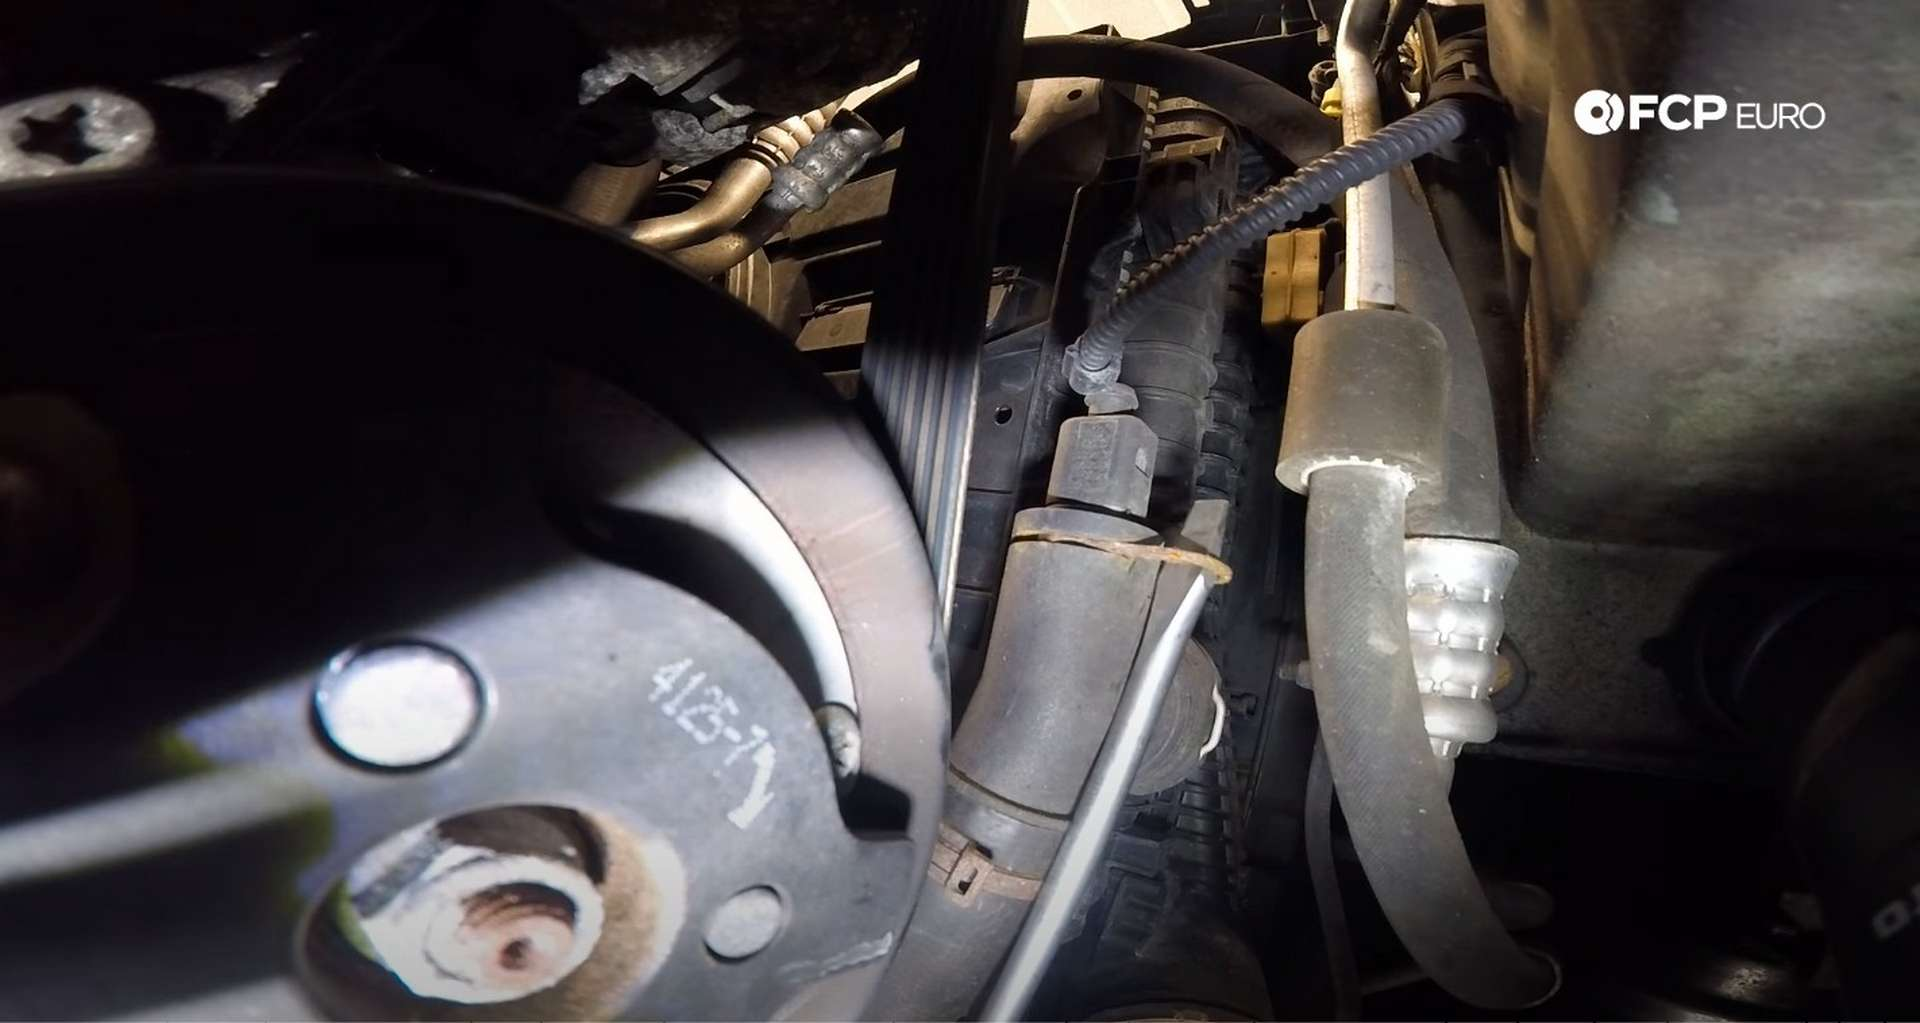 DIY MK7 VW GTI Turbocharger Upgrade unlocking the coolant temp sensor